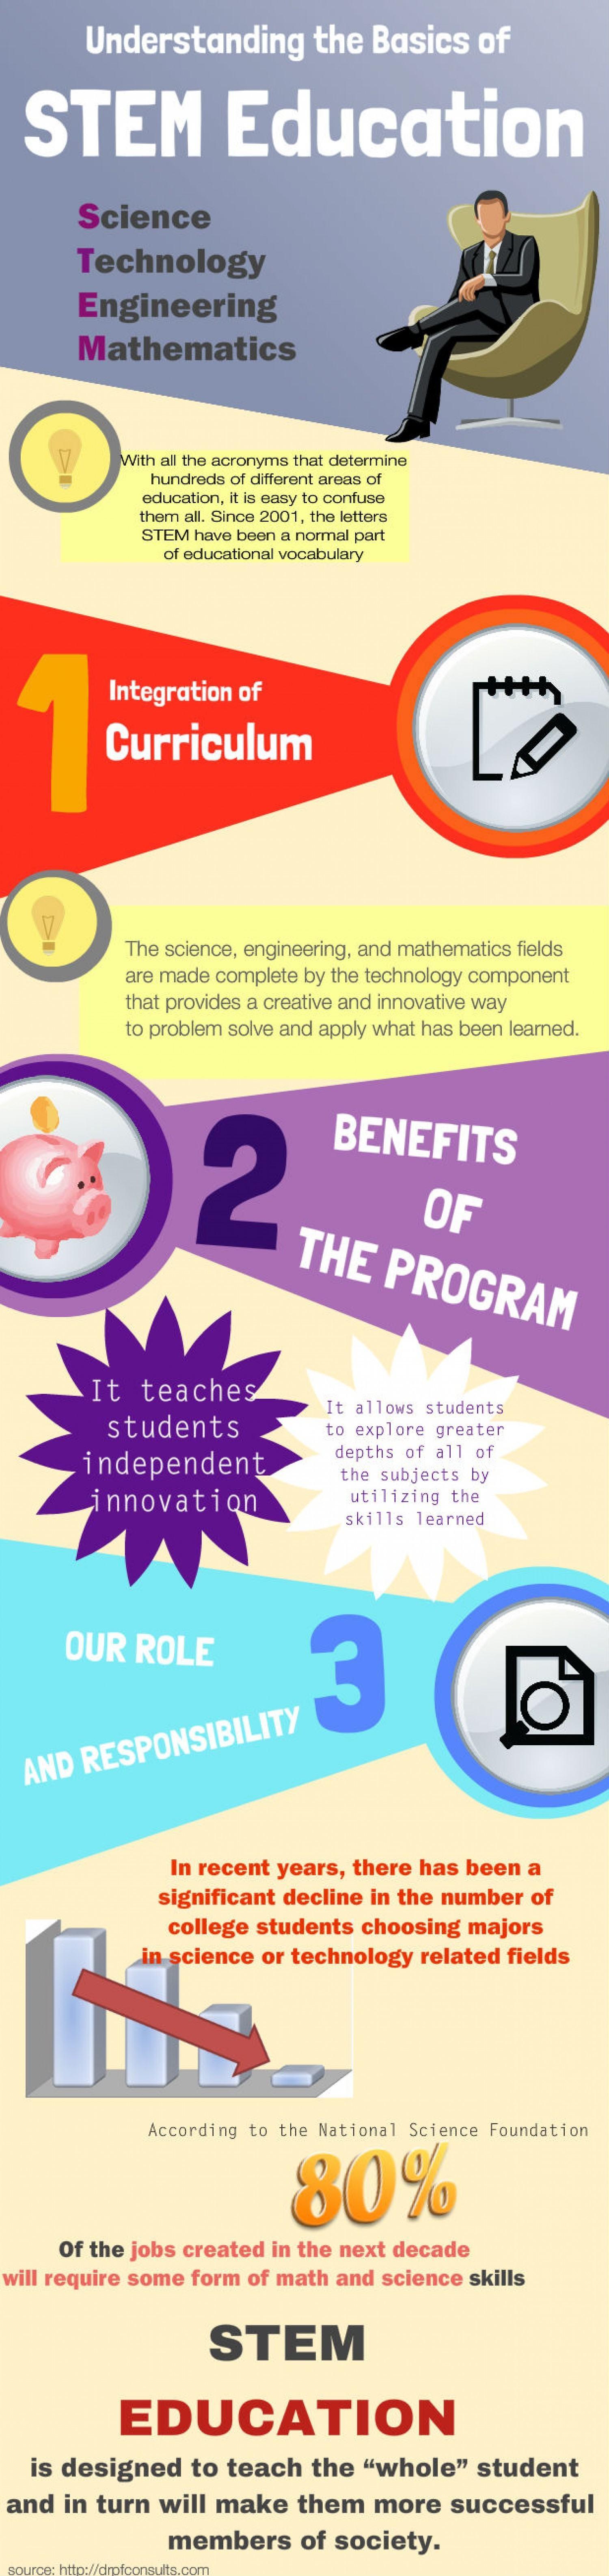 stem education infographic